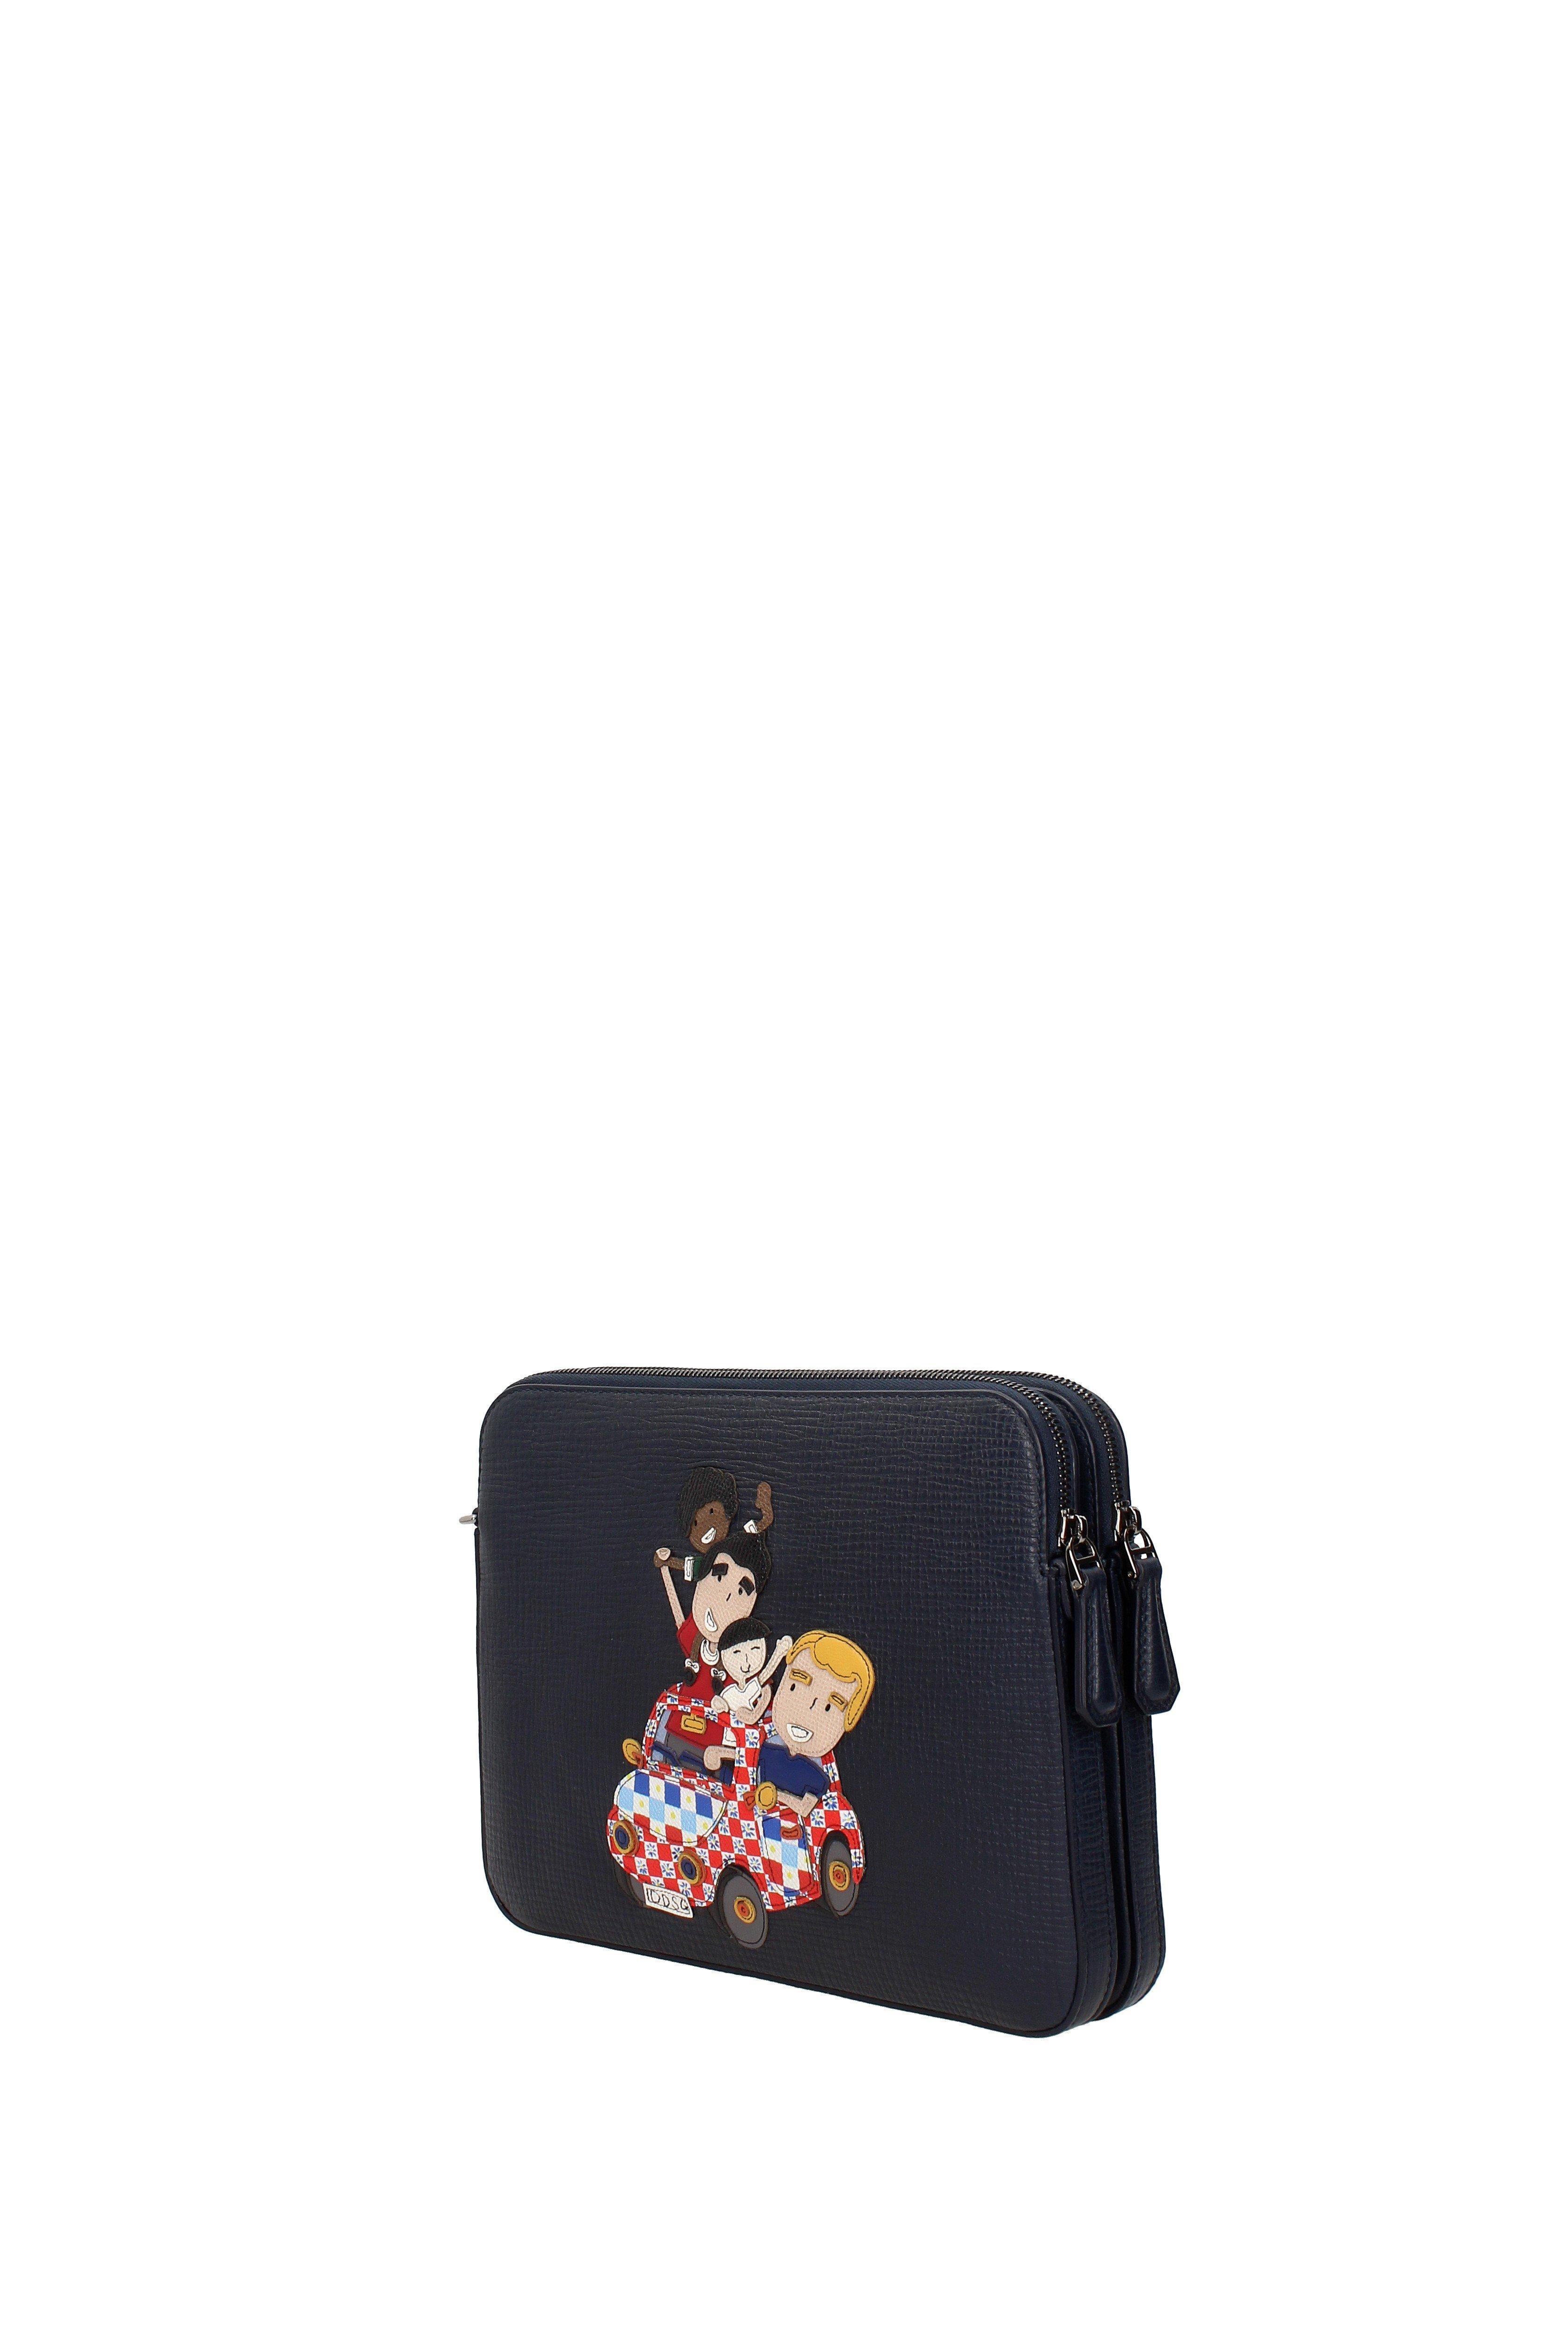 a5d1f68f9dfcc Lyst - Dolce & Gabbana Handbags